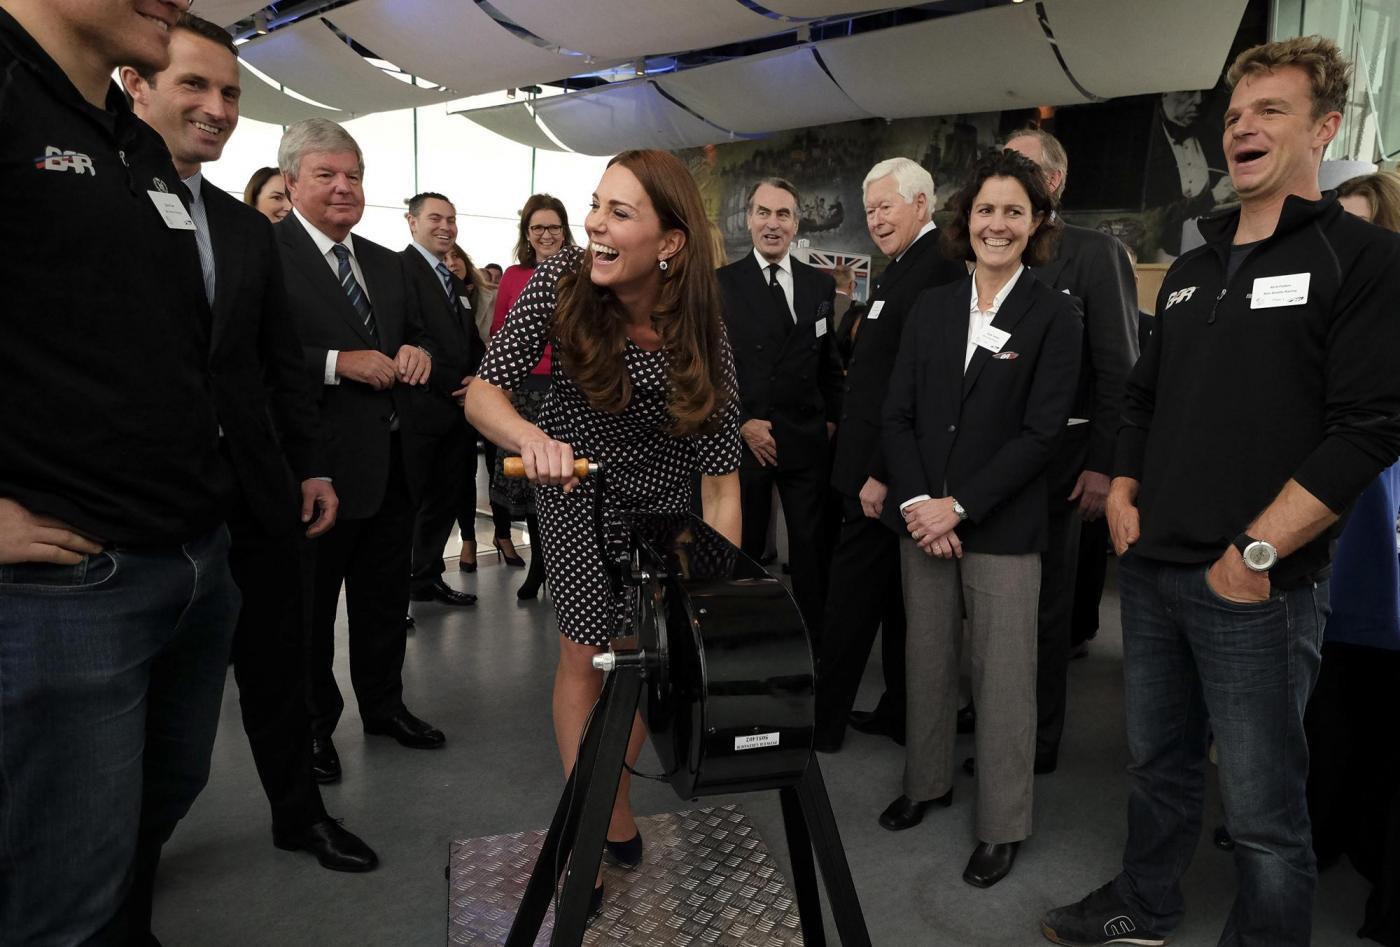 Kate Middleton torna dai Caraibi abbronzata e con un bel pancione 06